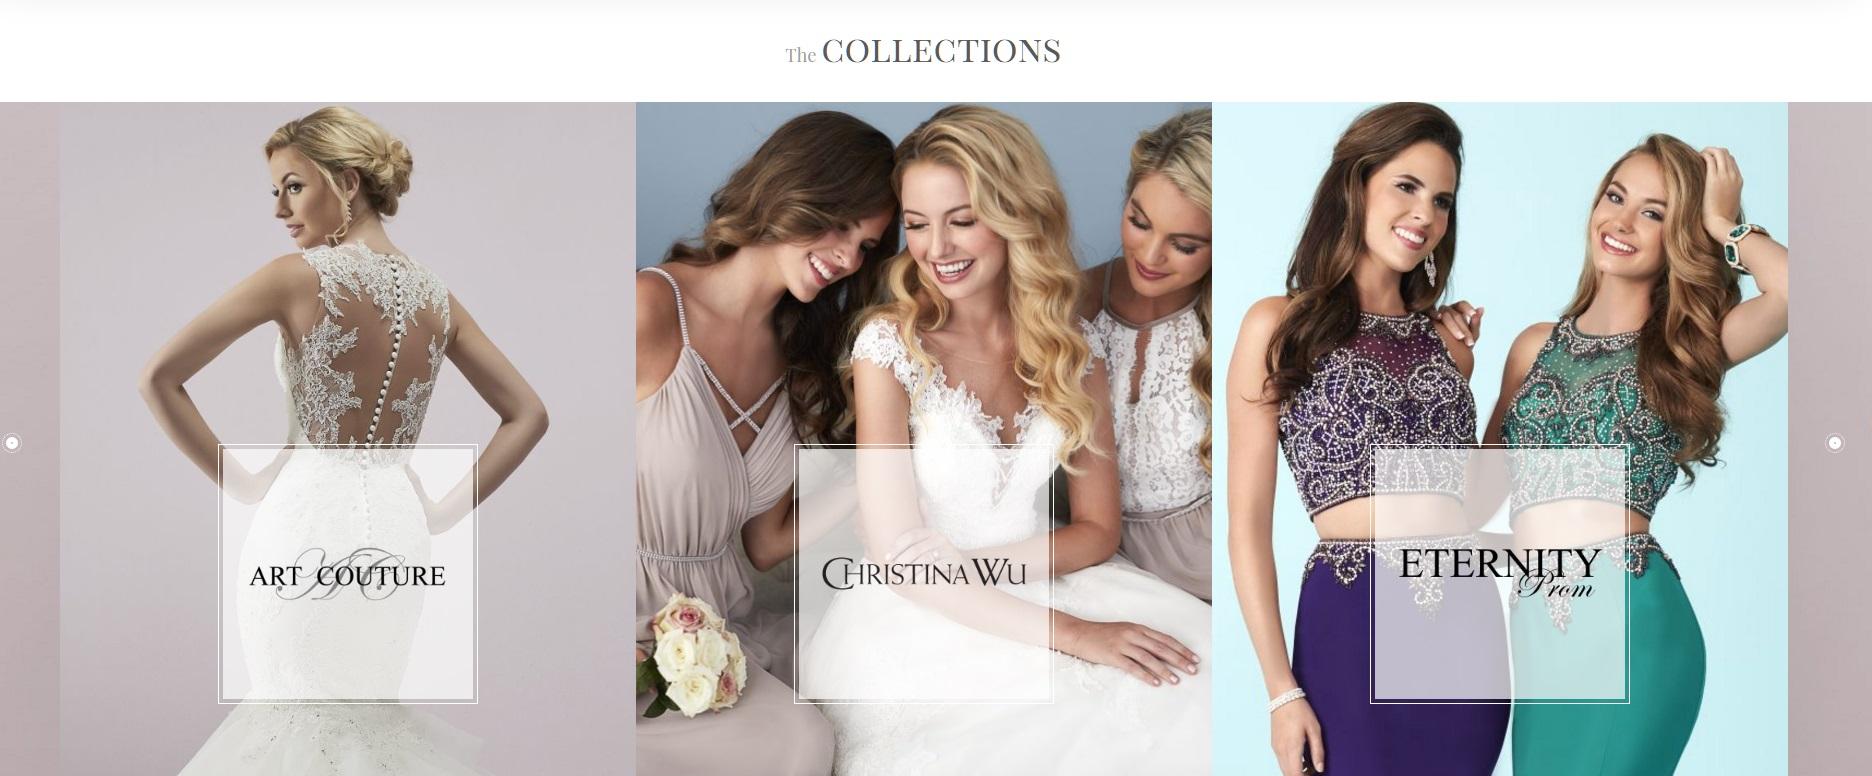 Eternity Bridal website